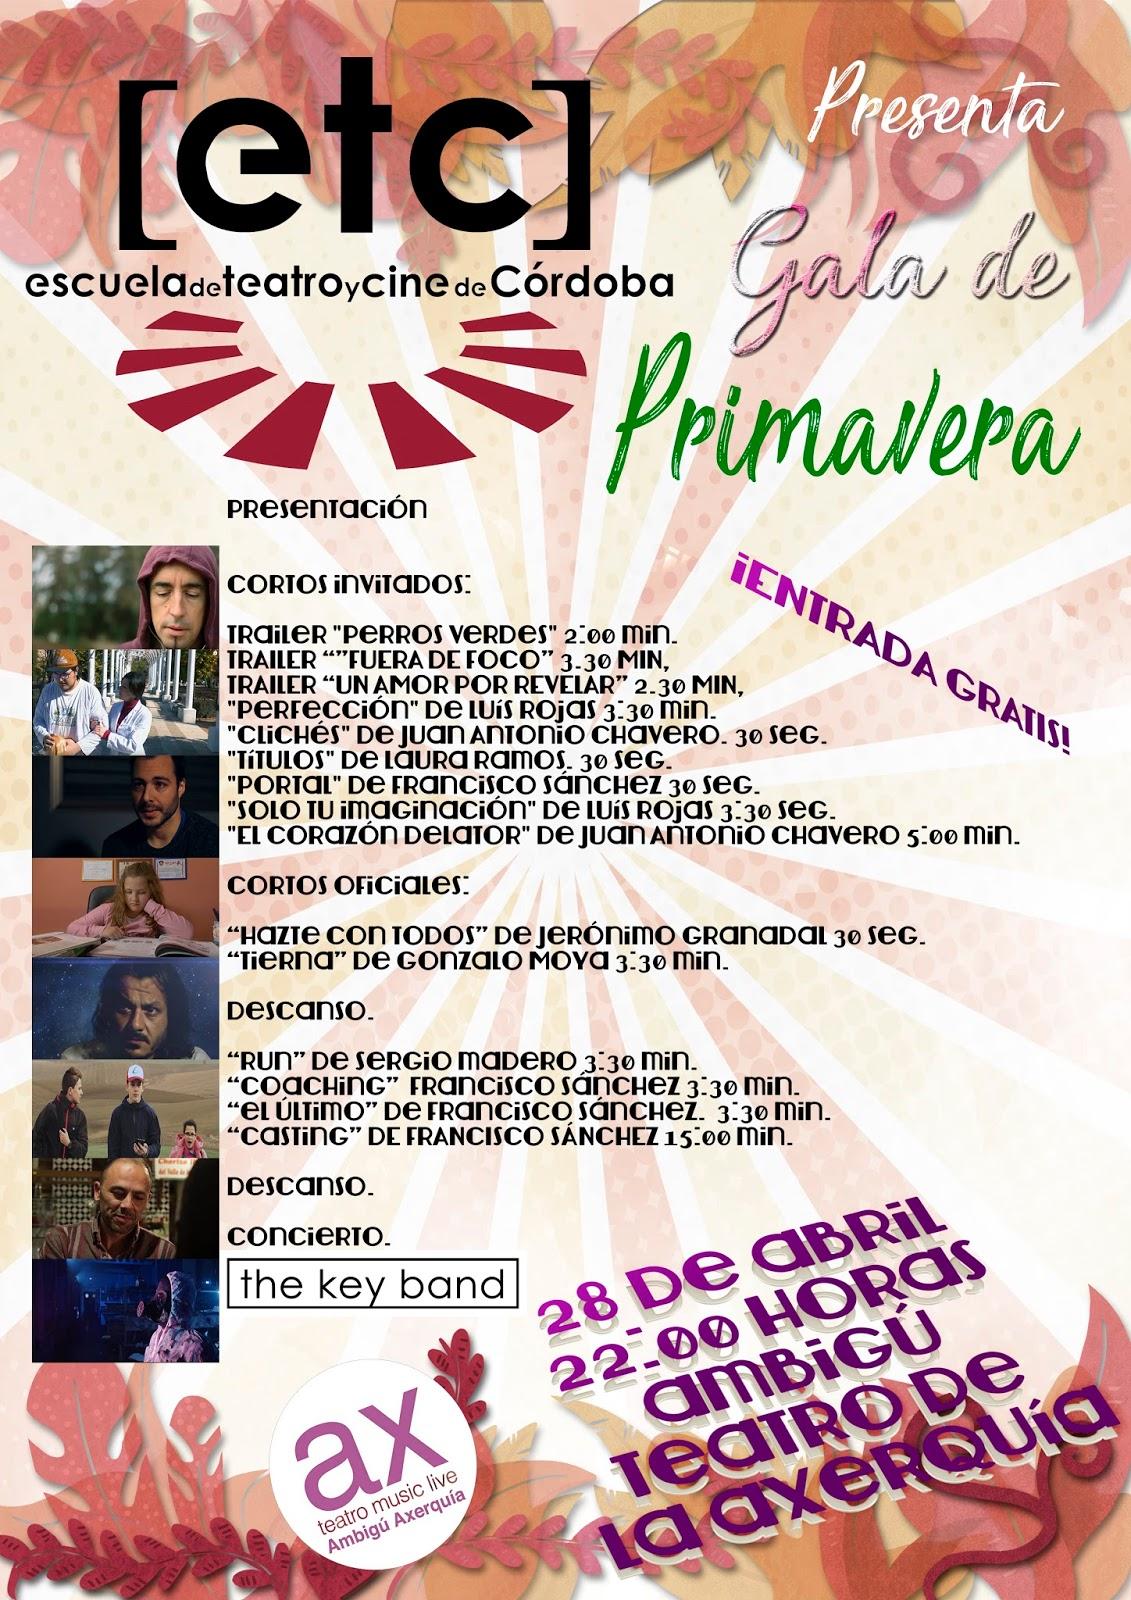 CARTEL_GALA_PRIMAVERA_V4.3